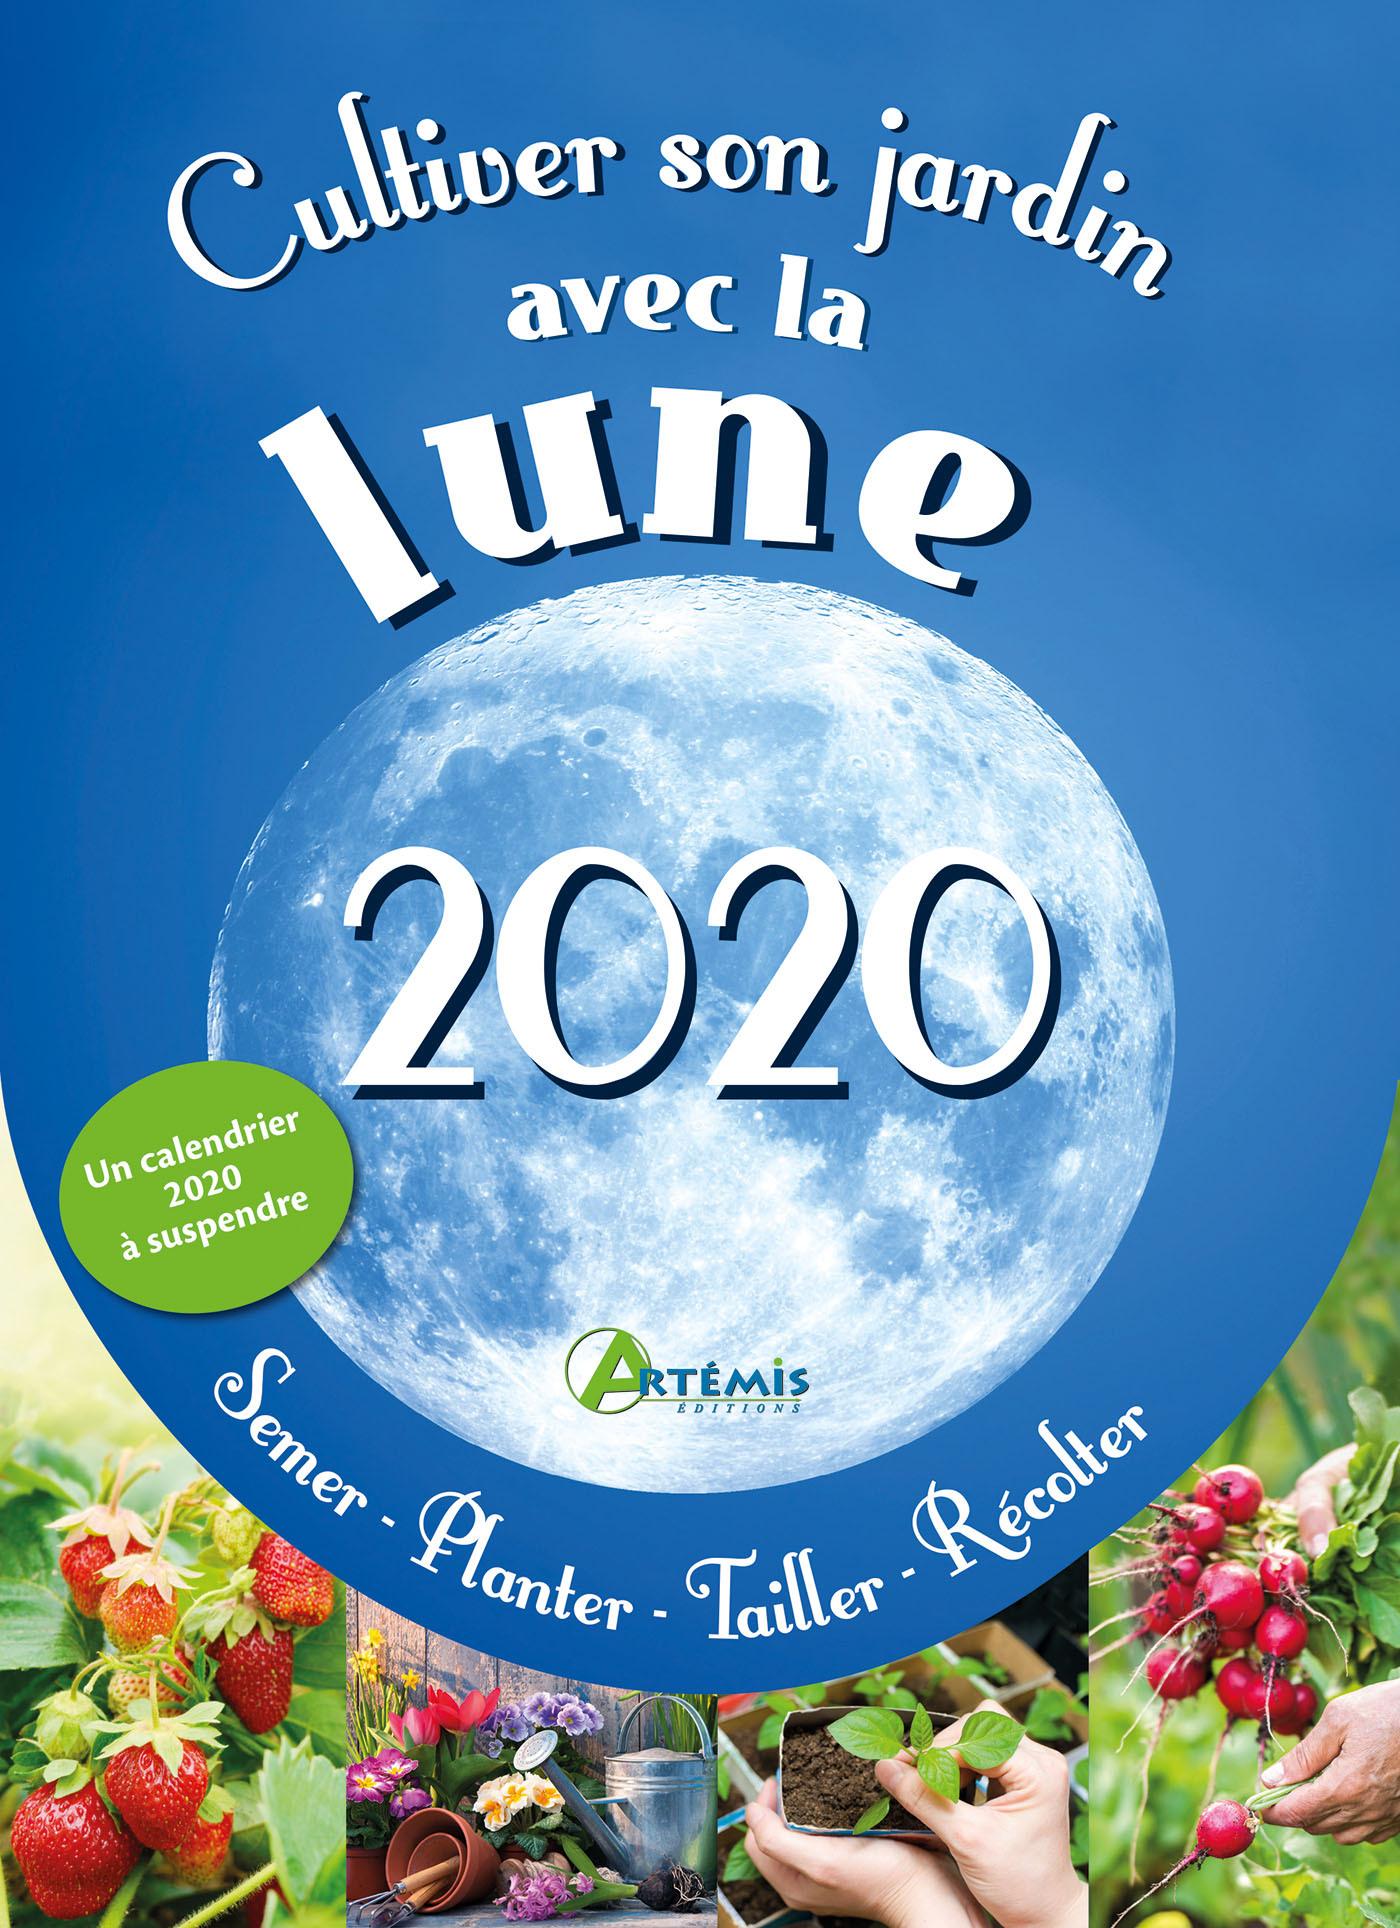 CULTIVER SON JARDIN AVEC LA LUNE 2020